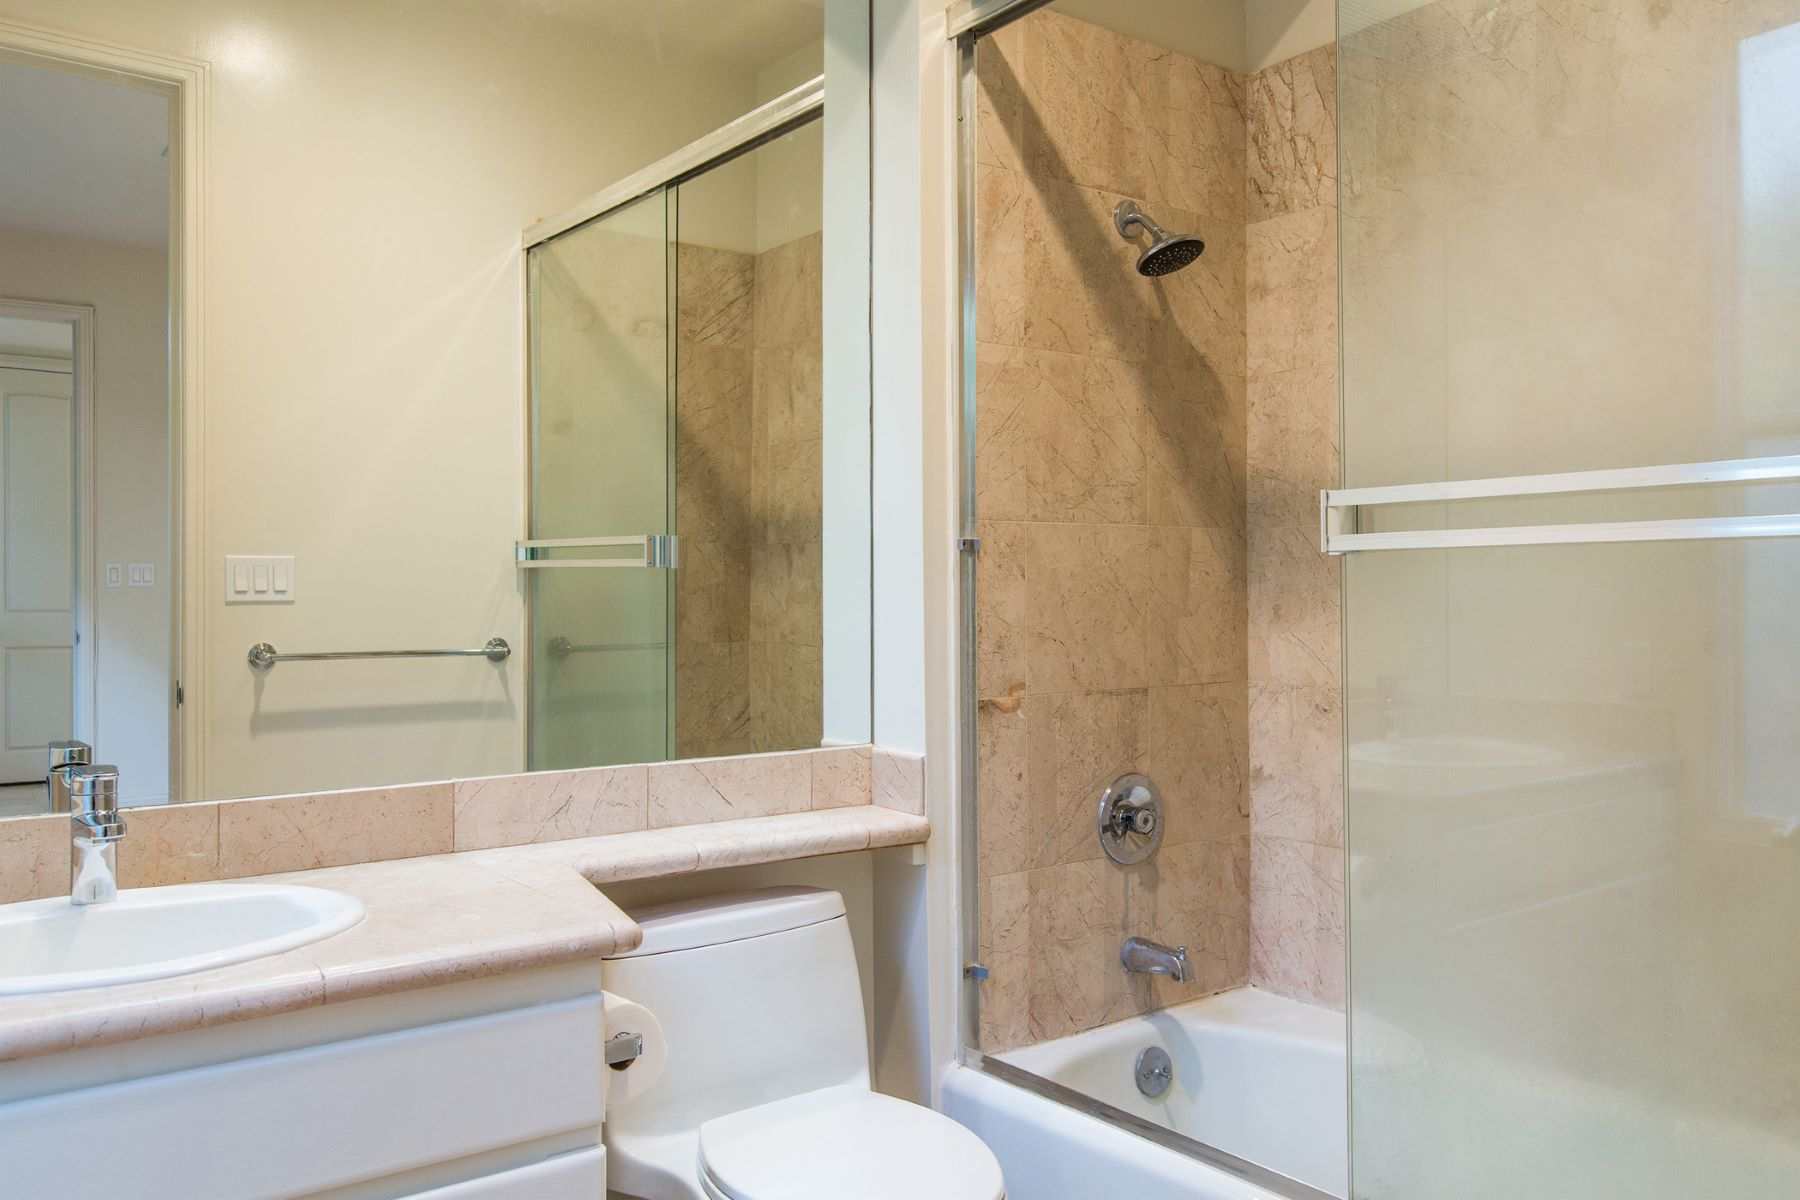 Additional photo for property listing at Grand Kahala Residence 4343 Kahala Avenue Honolulu, Hawaii 96816 United States